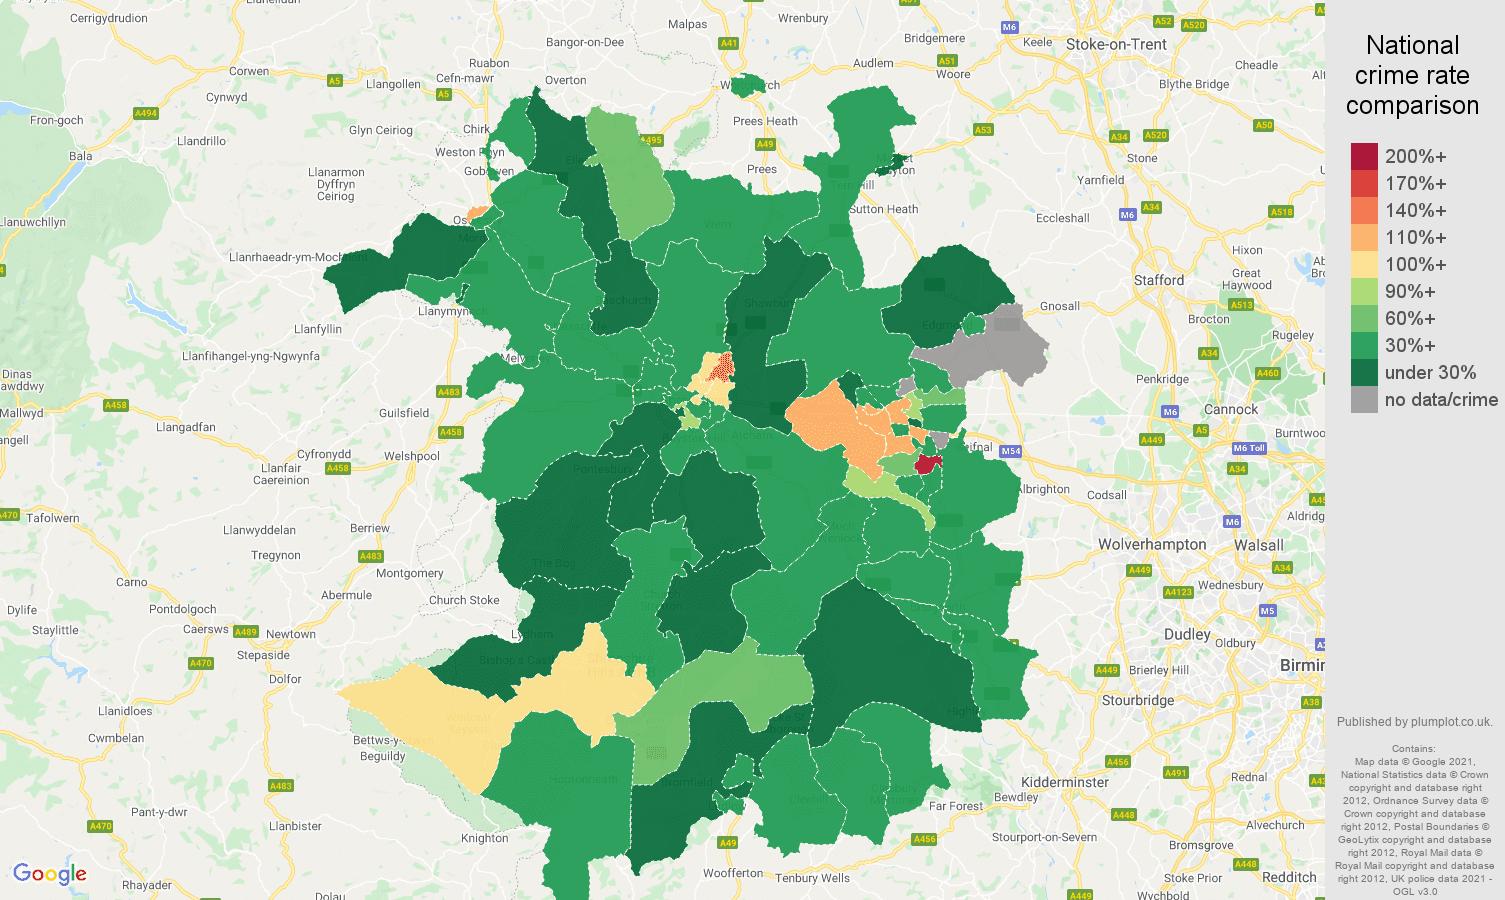 Shropshire drugs crime rate comparison map